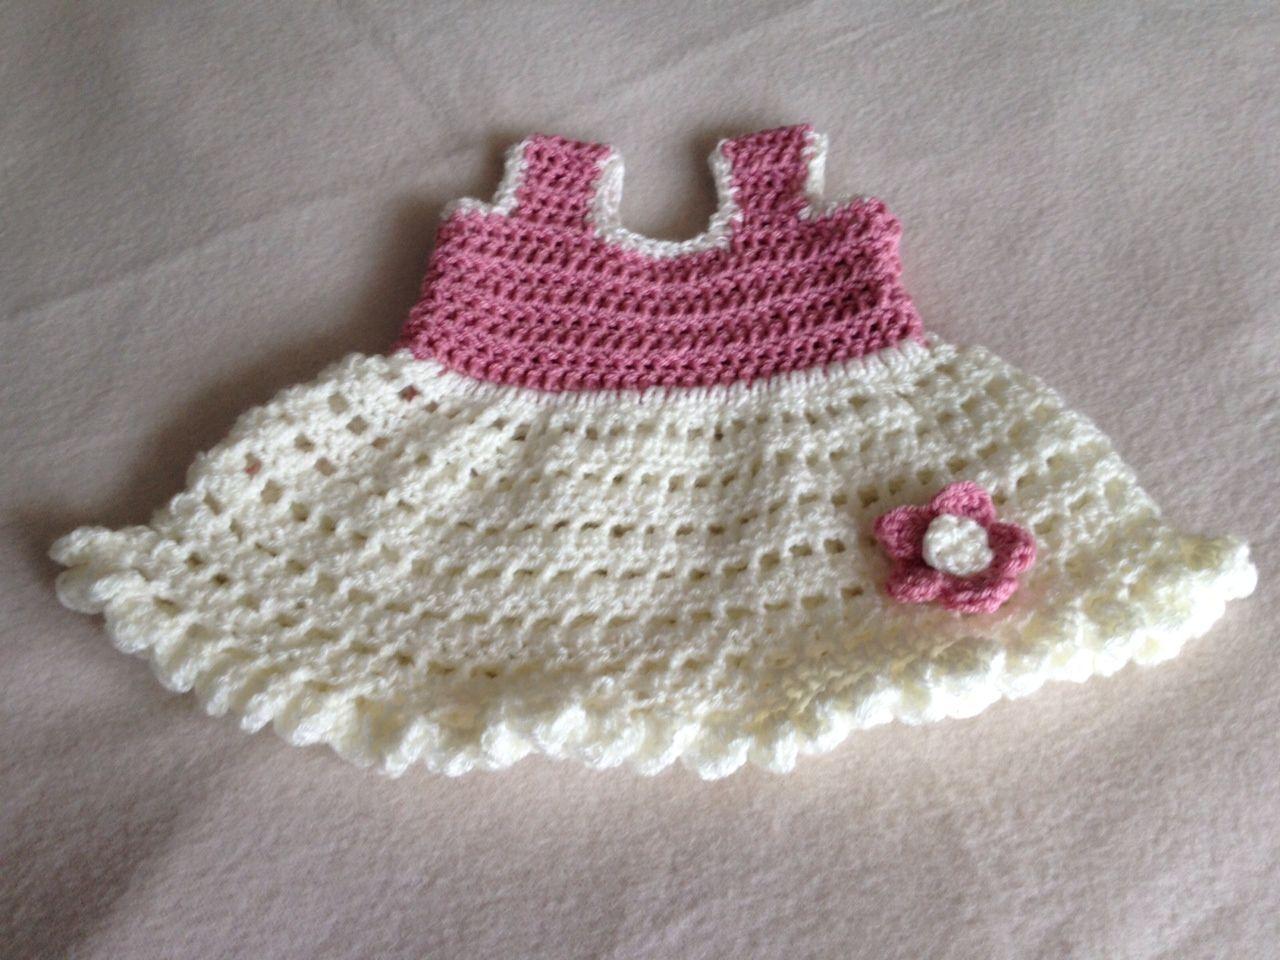 Frilly flower crochet baby dress. Free written pattern ... thanks ...